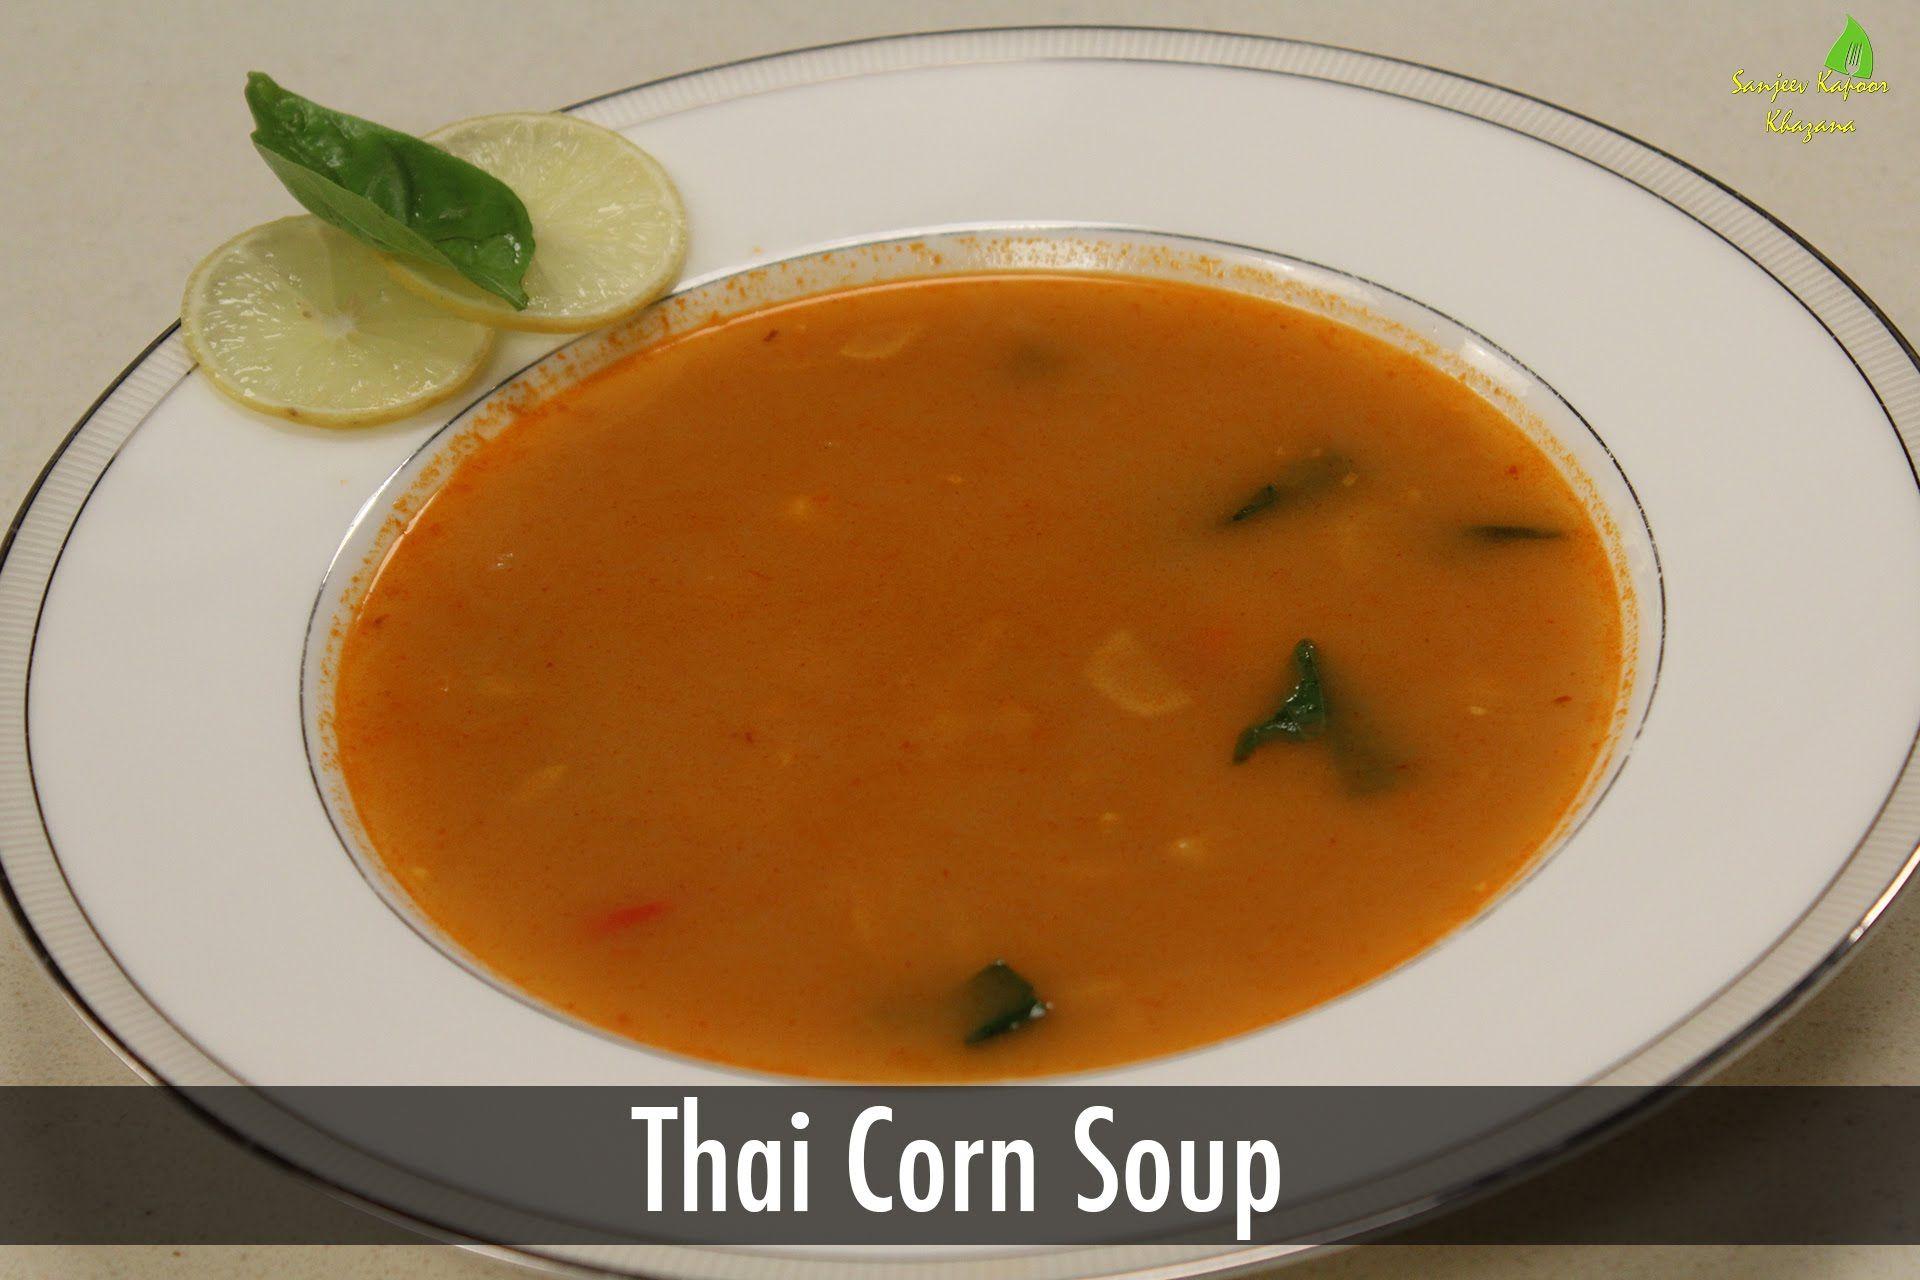 Thai corn soup sanjeev kapoor khazana yumm ix pinterest thai corn soup sanjeev kapoor khazana forumfinder Image collections